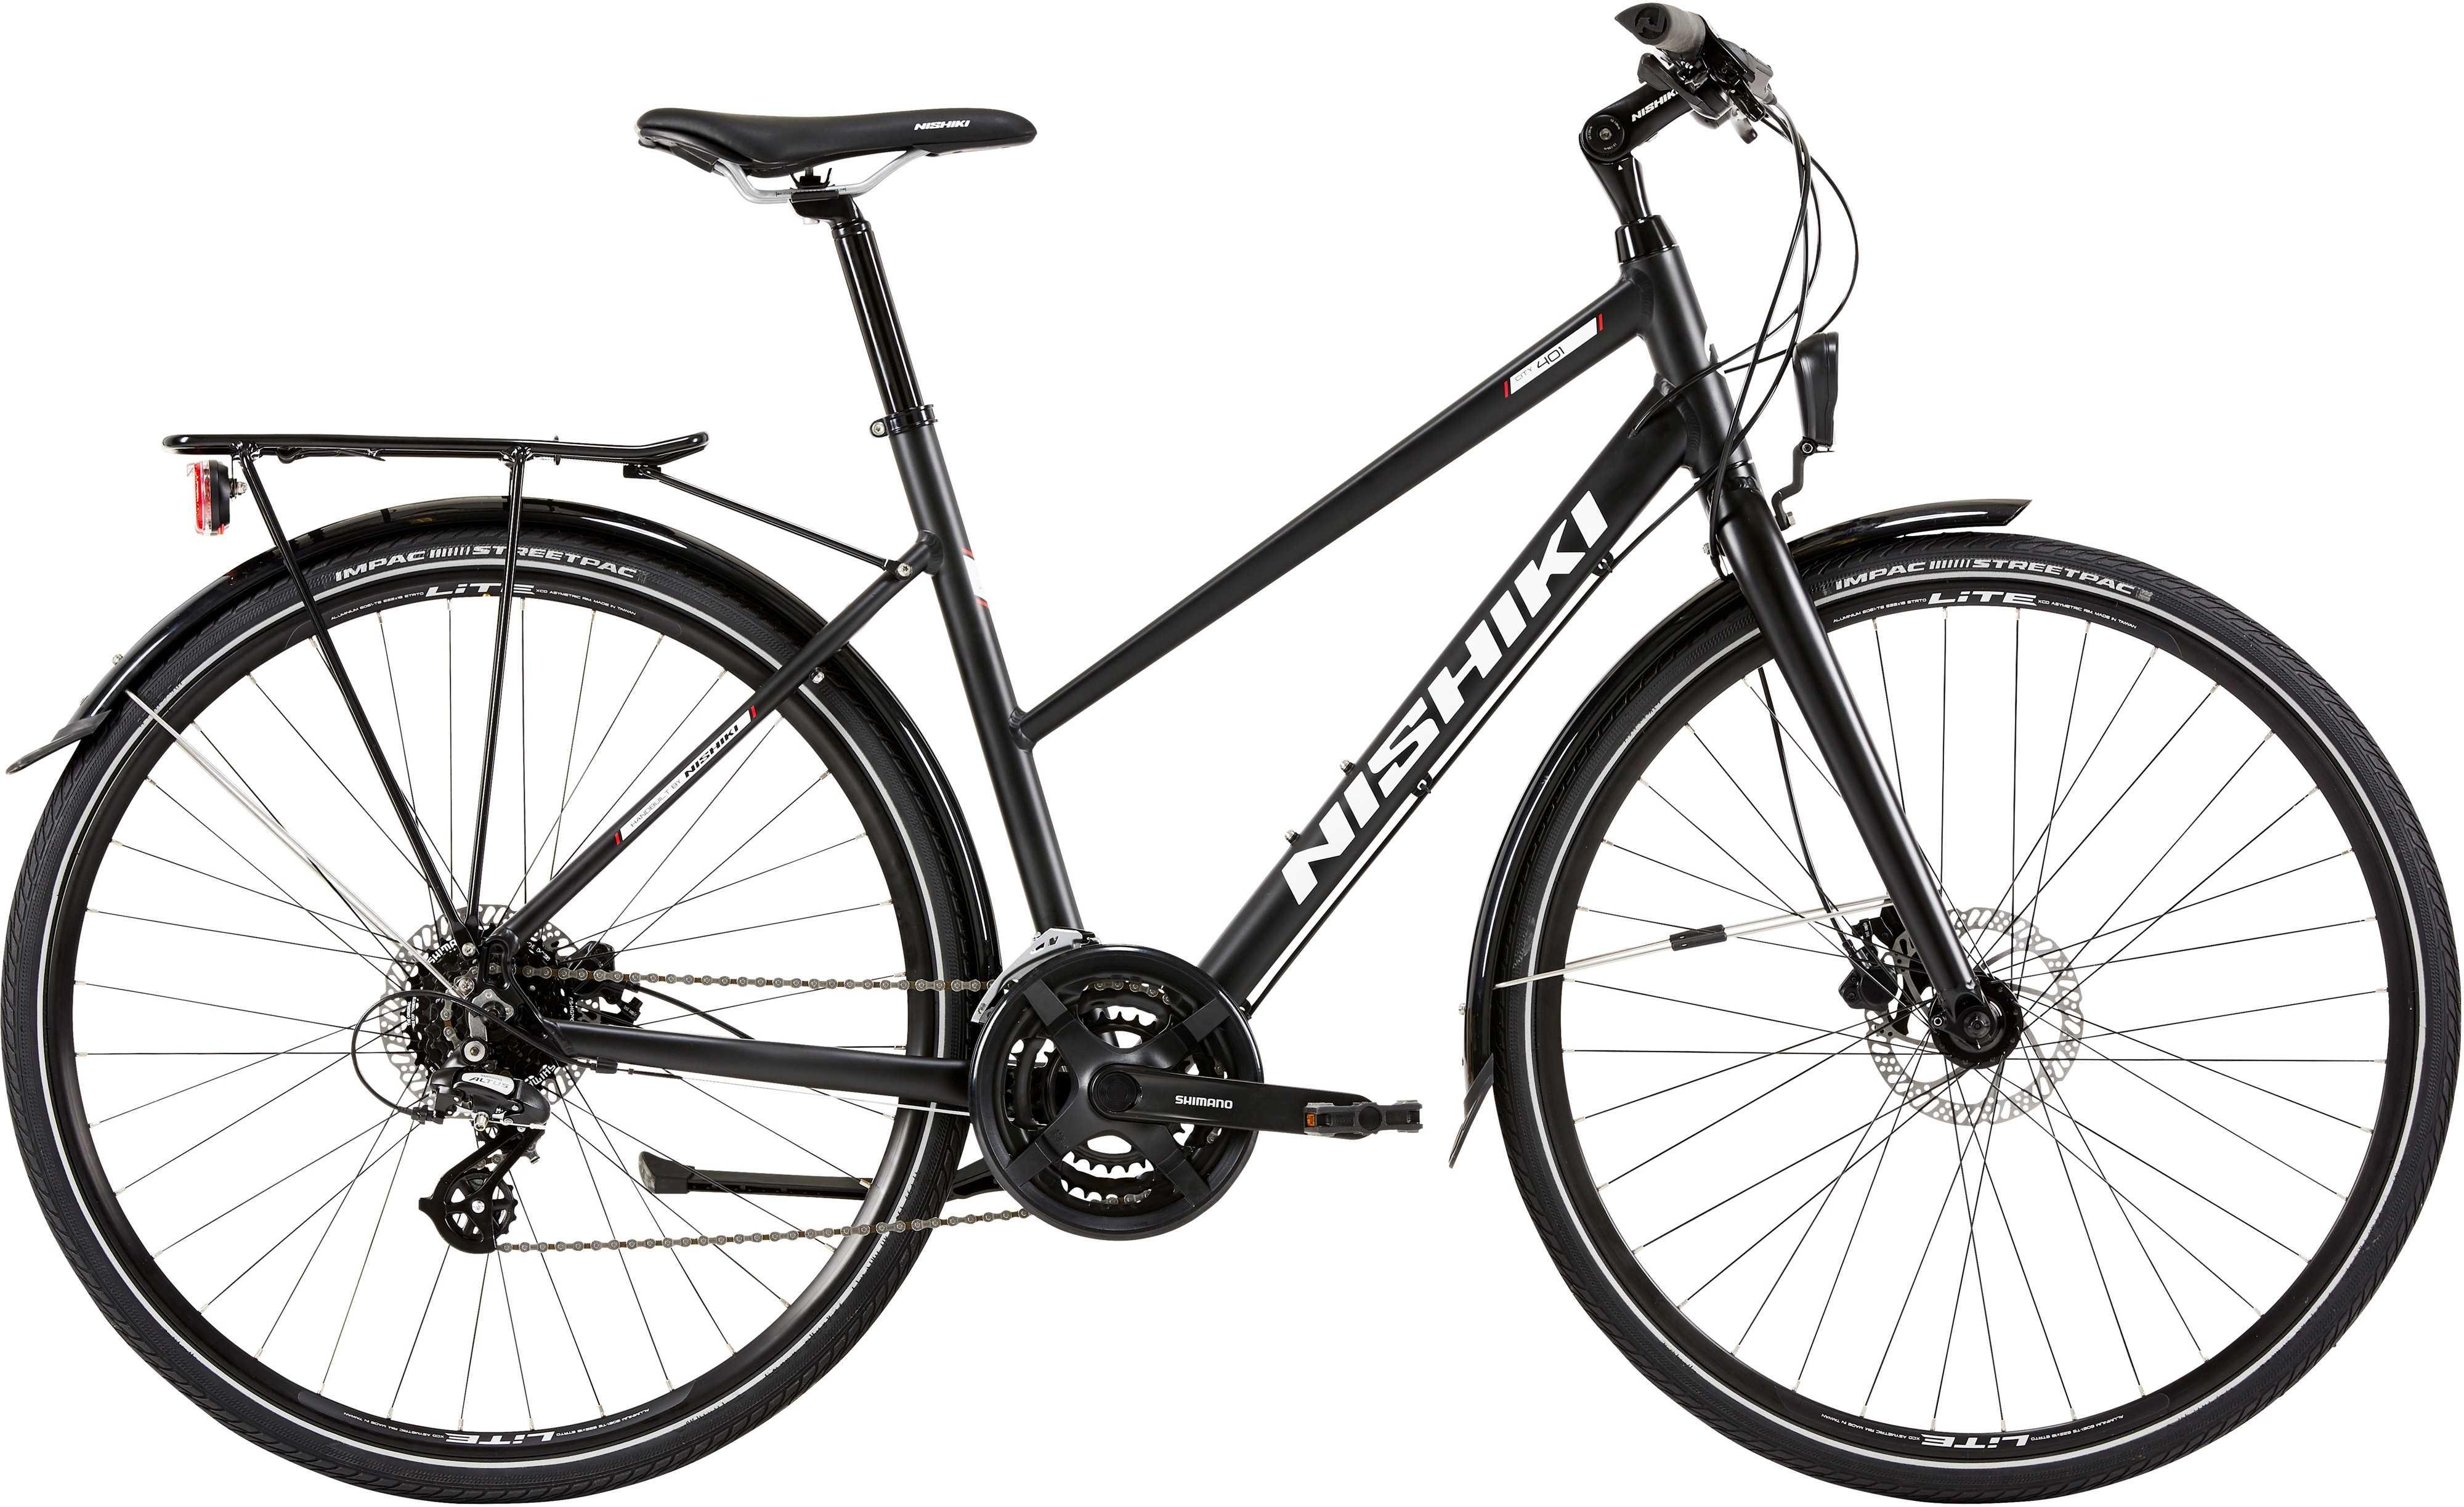 Nishiki City 401 dam svart | City-cykler